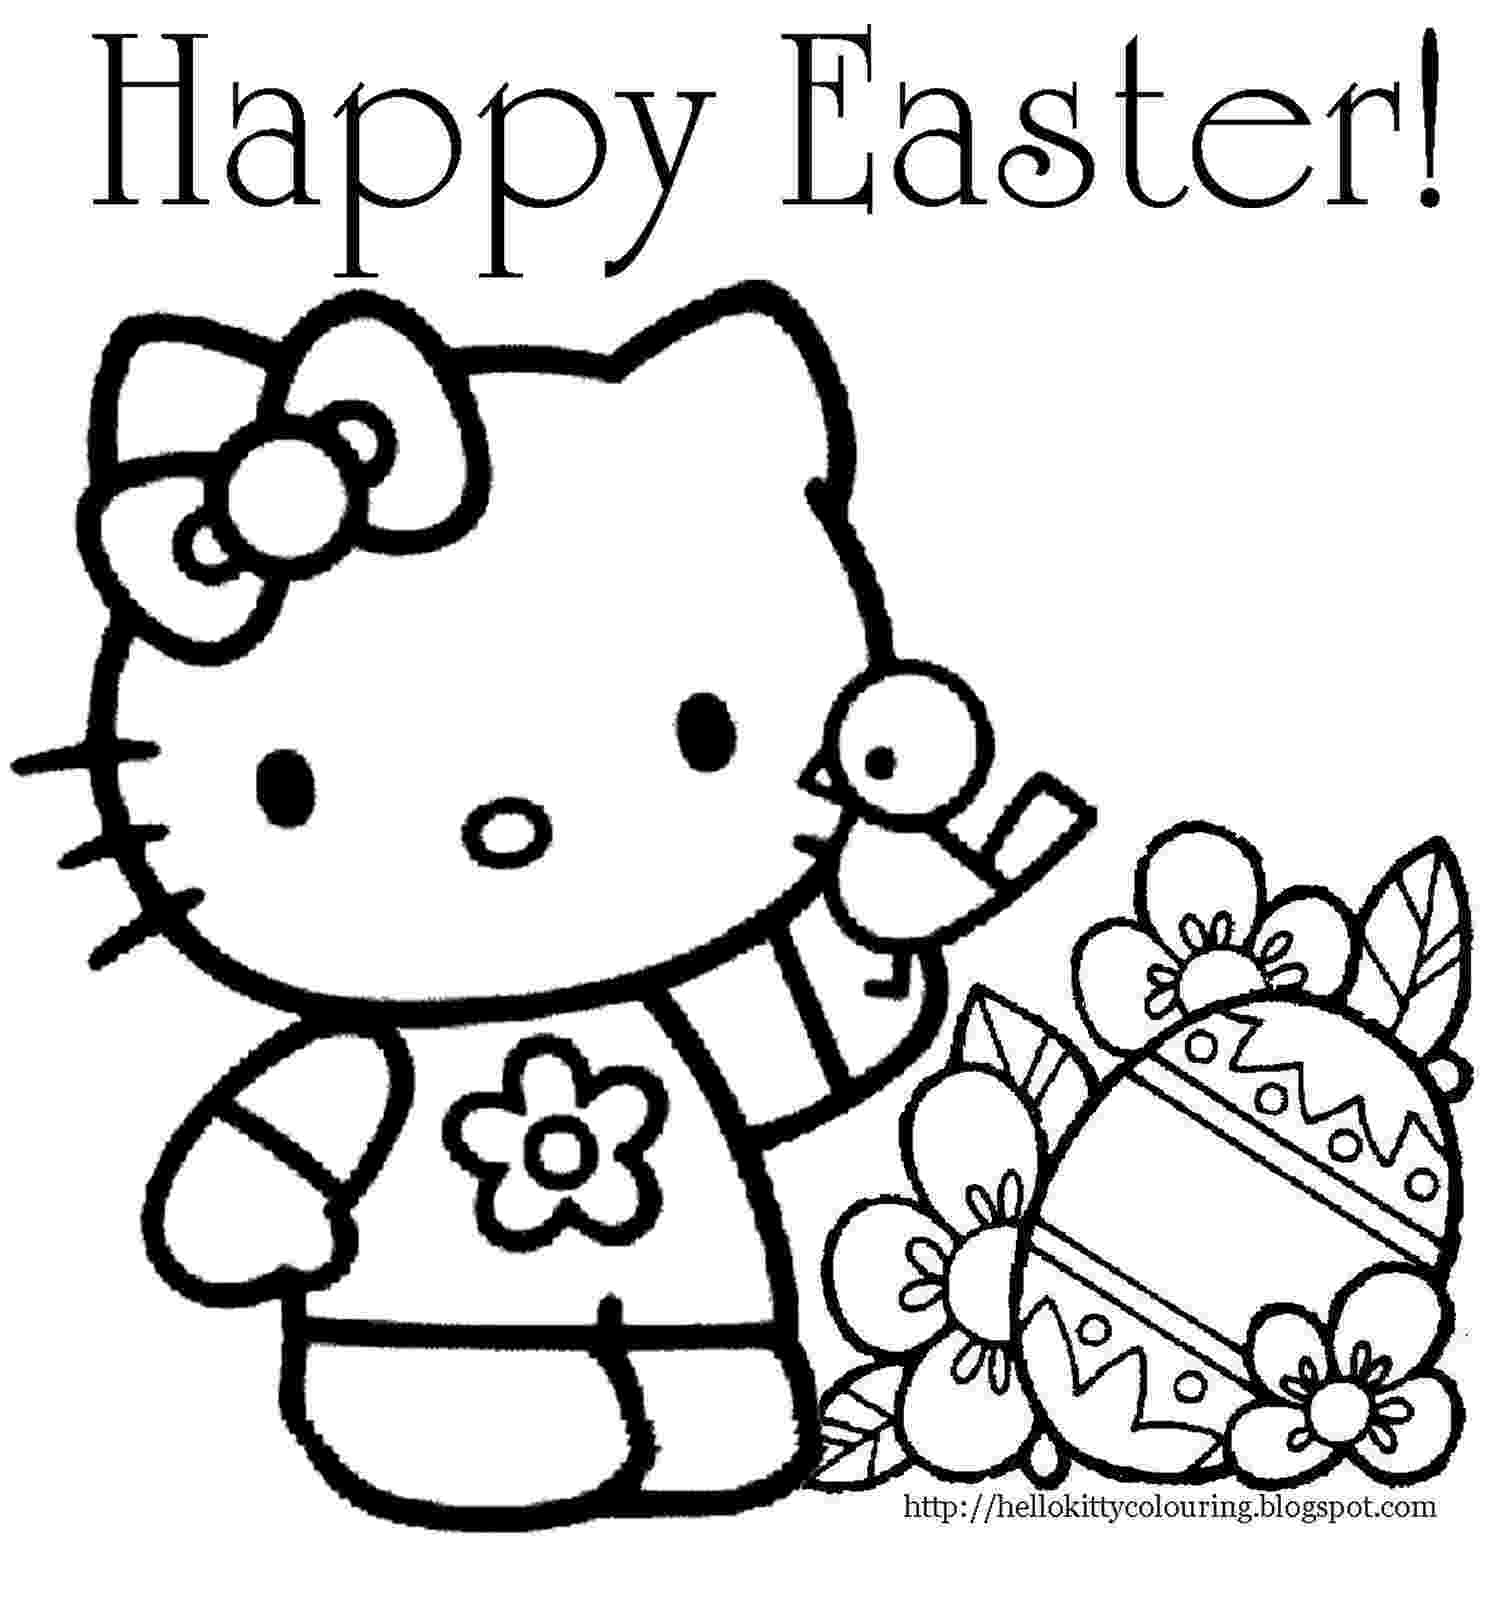 coloring book hello kitty free printable hello kitty coloring pages for pages coloring kitty hello book